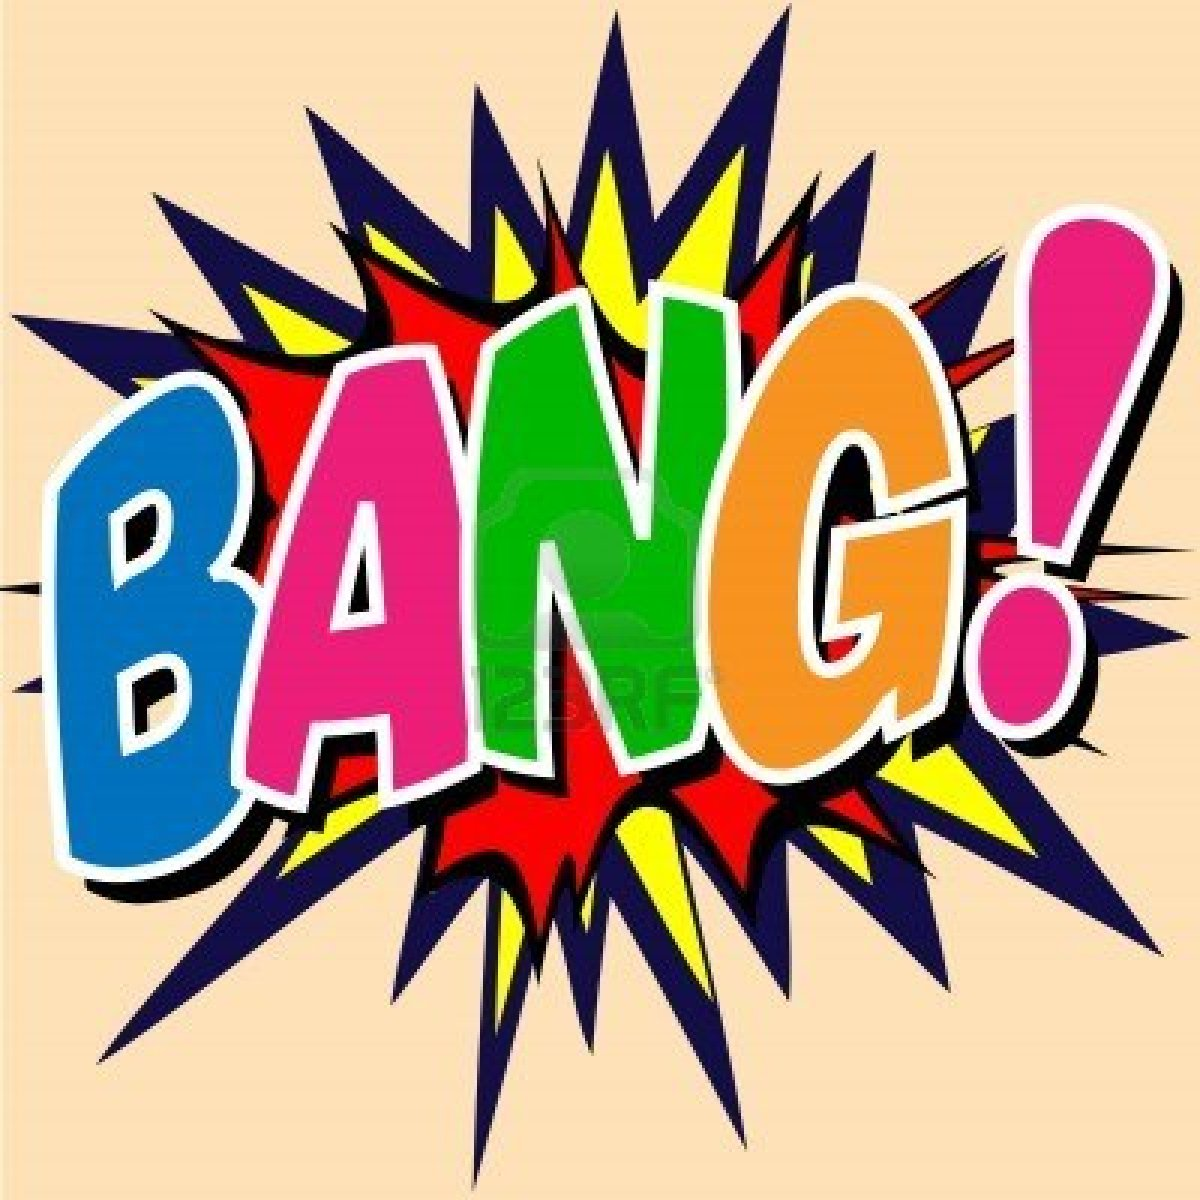 Noise clipart wham Illustration Book Pow! Comic Bang